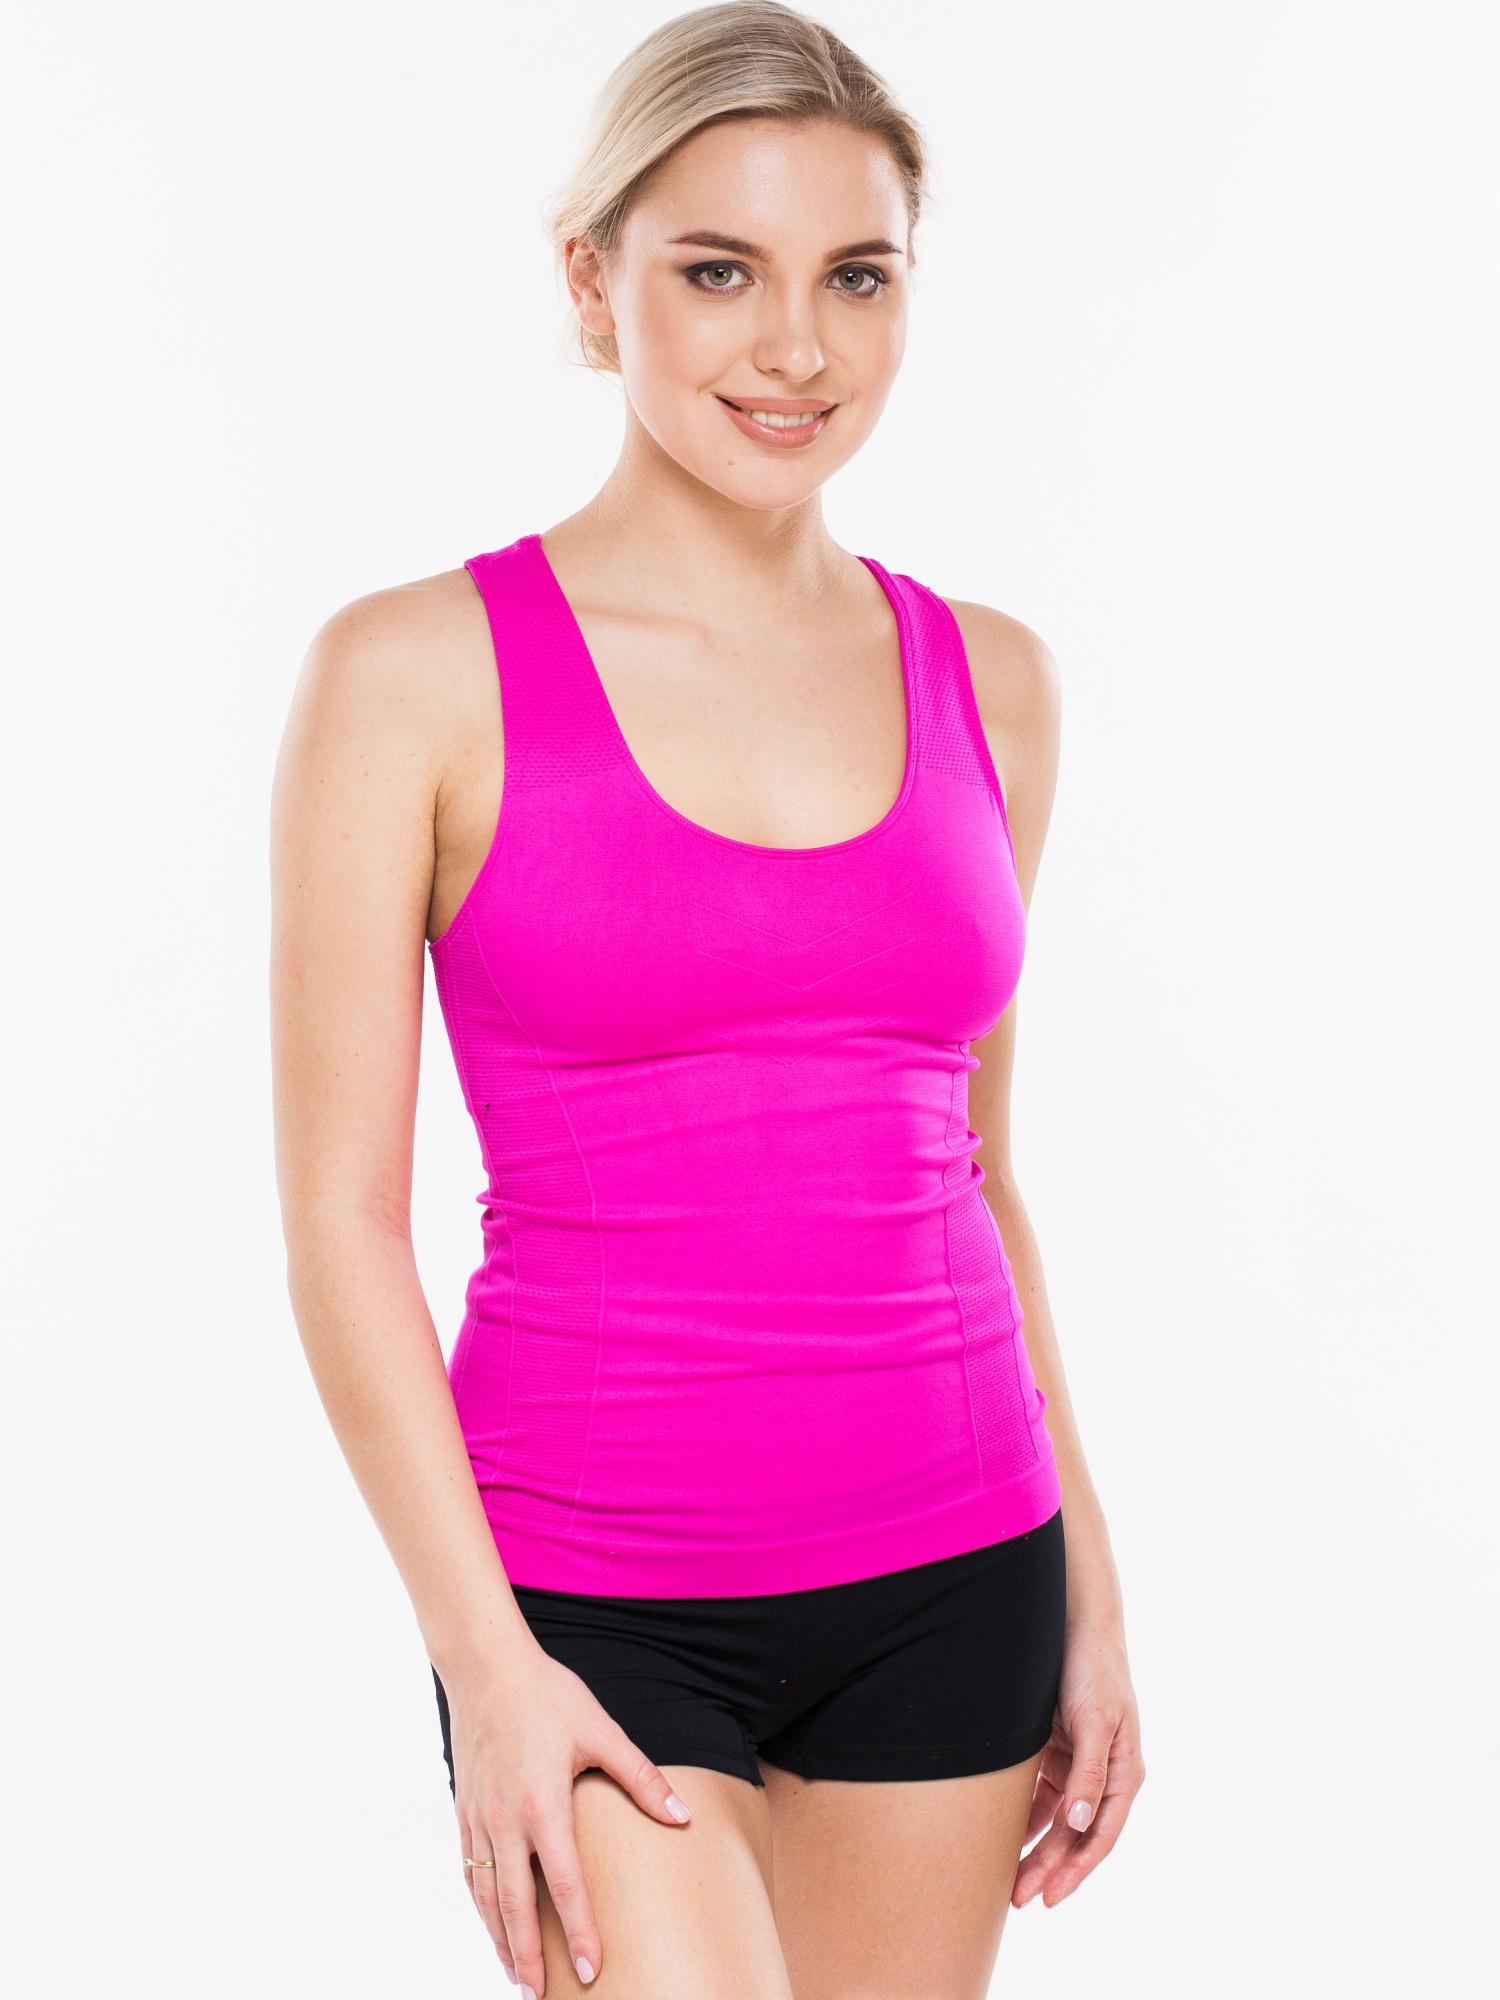 Майка MORERA 35840M ELECTRIC VIOLA (XL), темно-розовый 48 размер35840M ELECTRIC VIOLA (XL)Спортивная майка для спорта, фитнеса, бега, йоги и т.д.